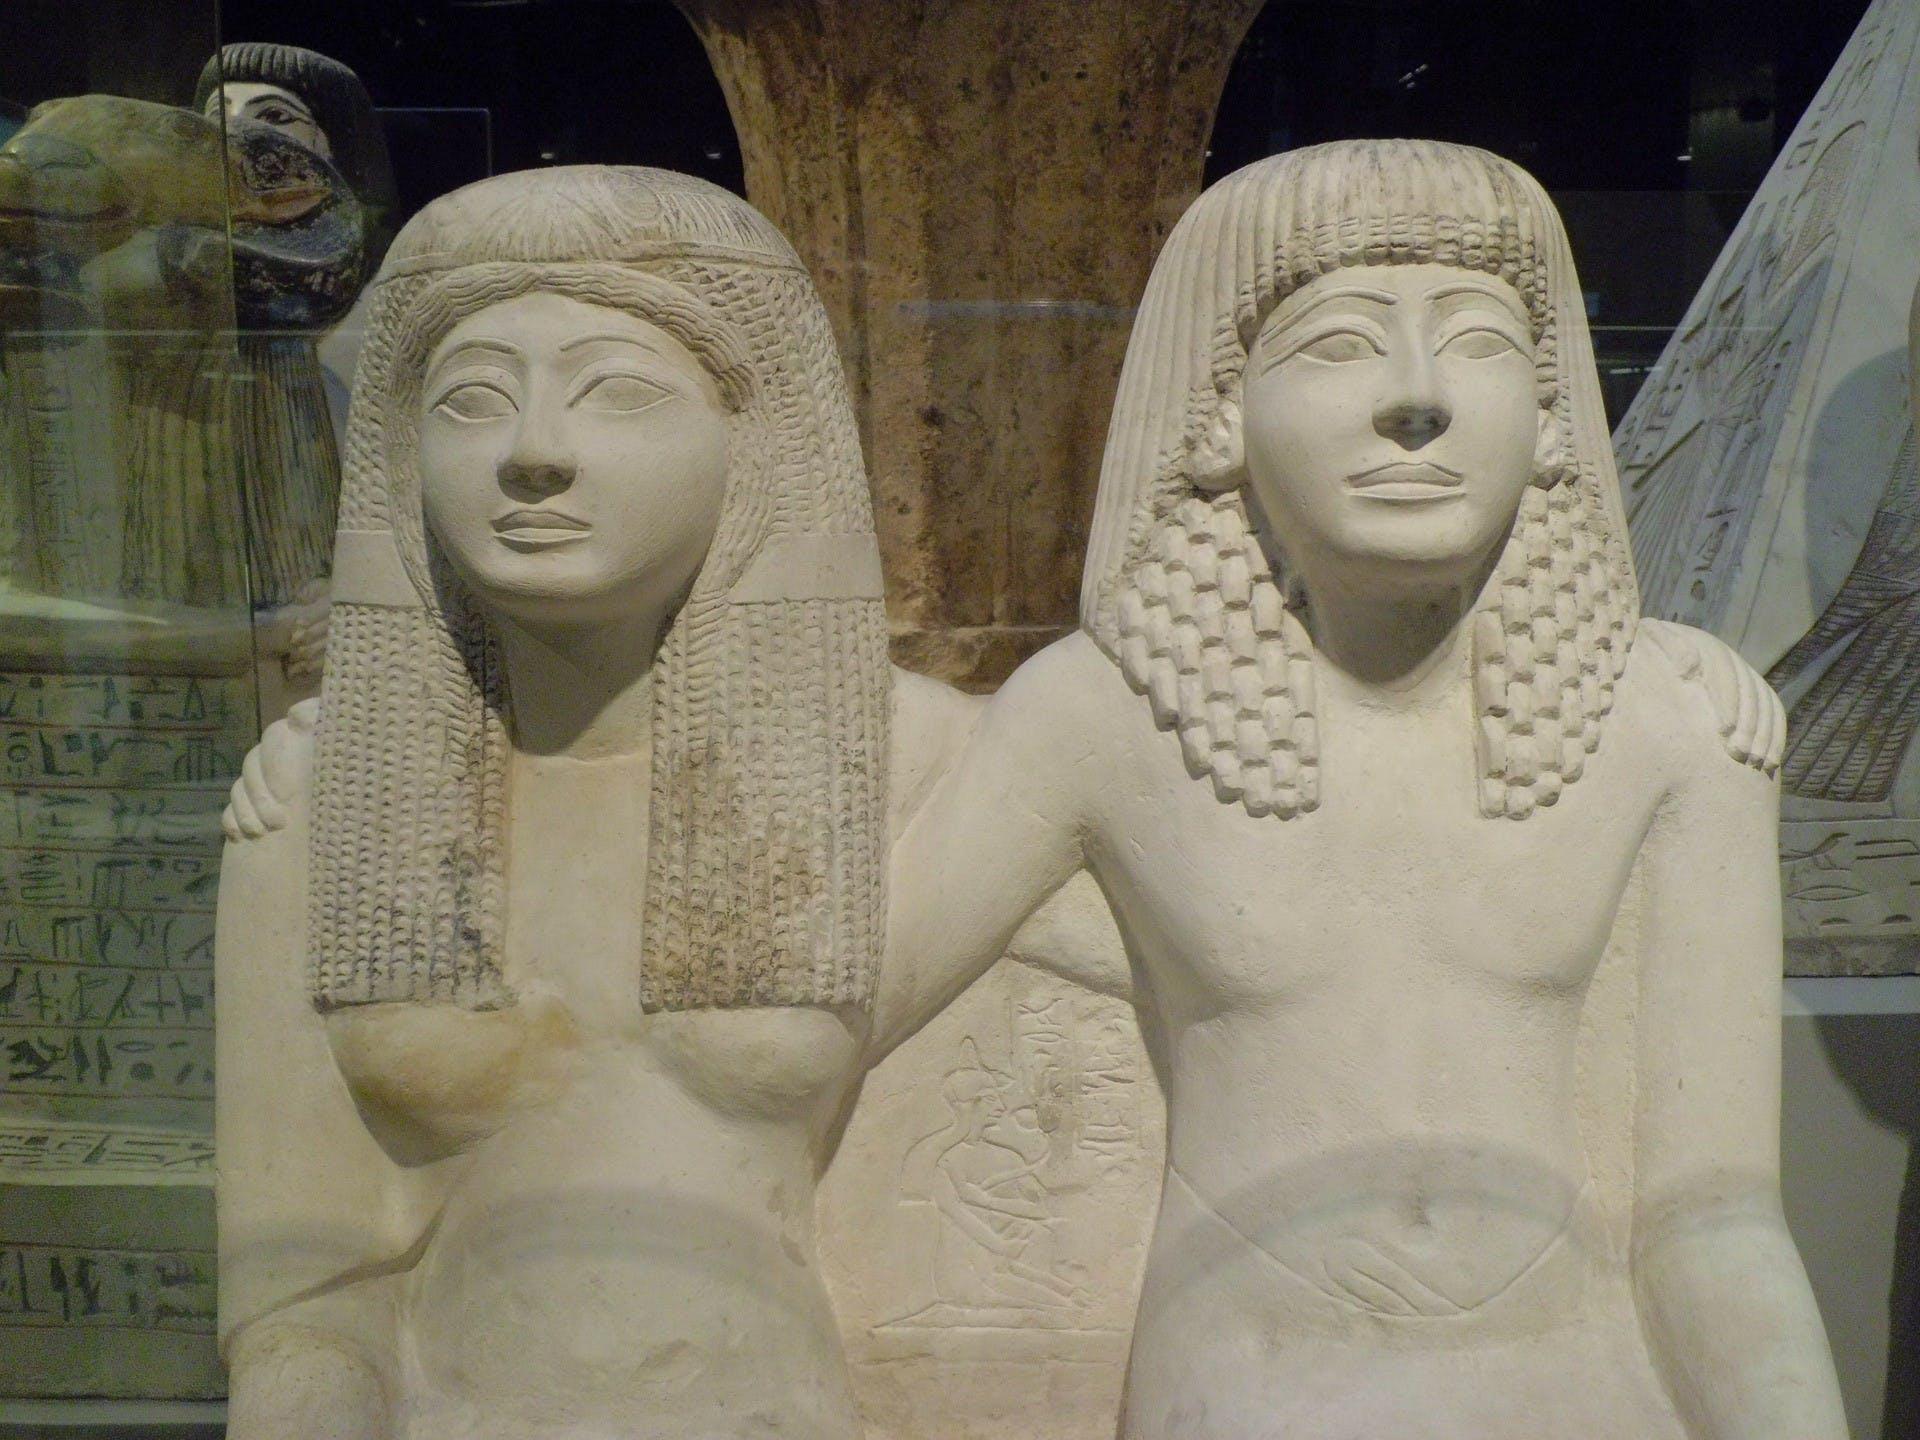 Egipto-Museo-221786_1920.jpg